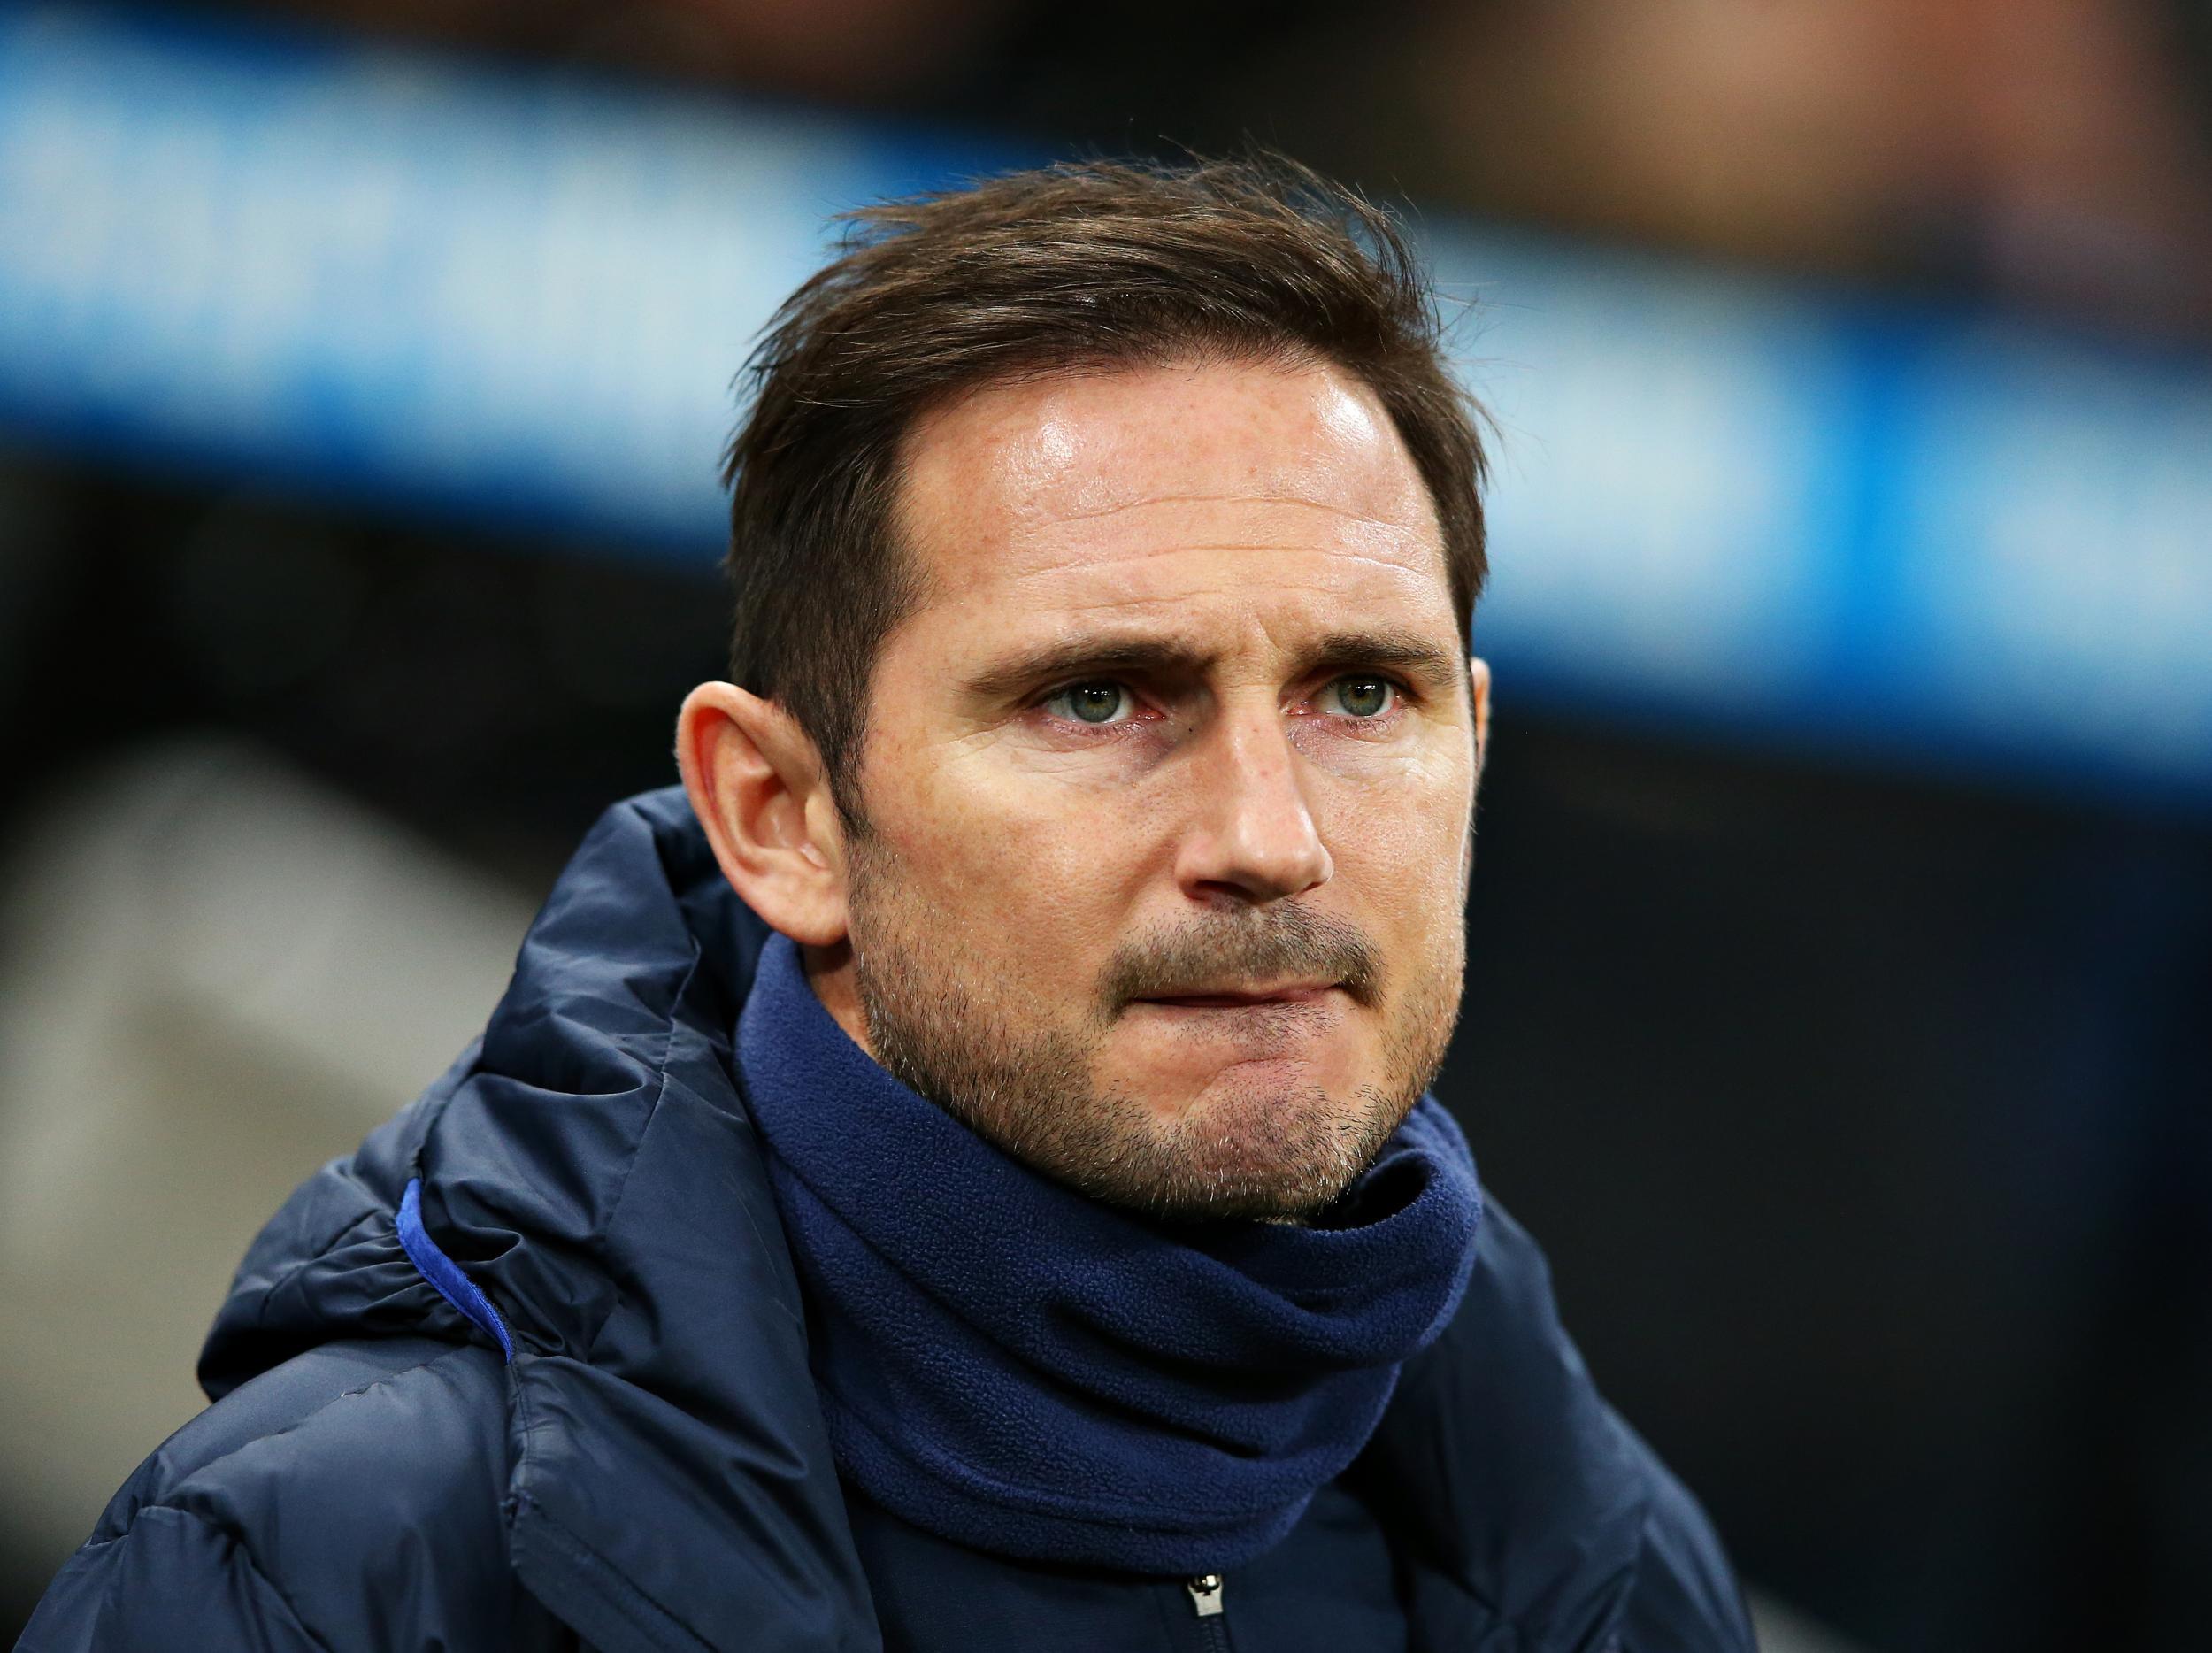 Chelsea transfer news: Frank Lampard ready to strengthen team when window opens